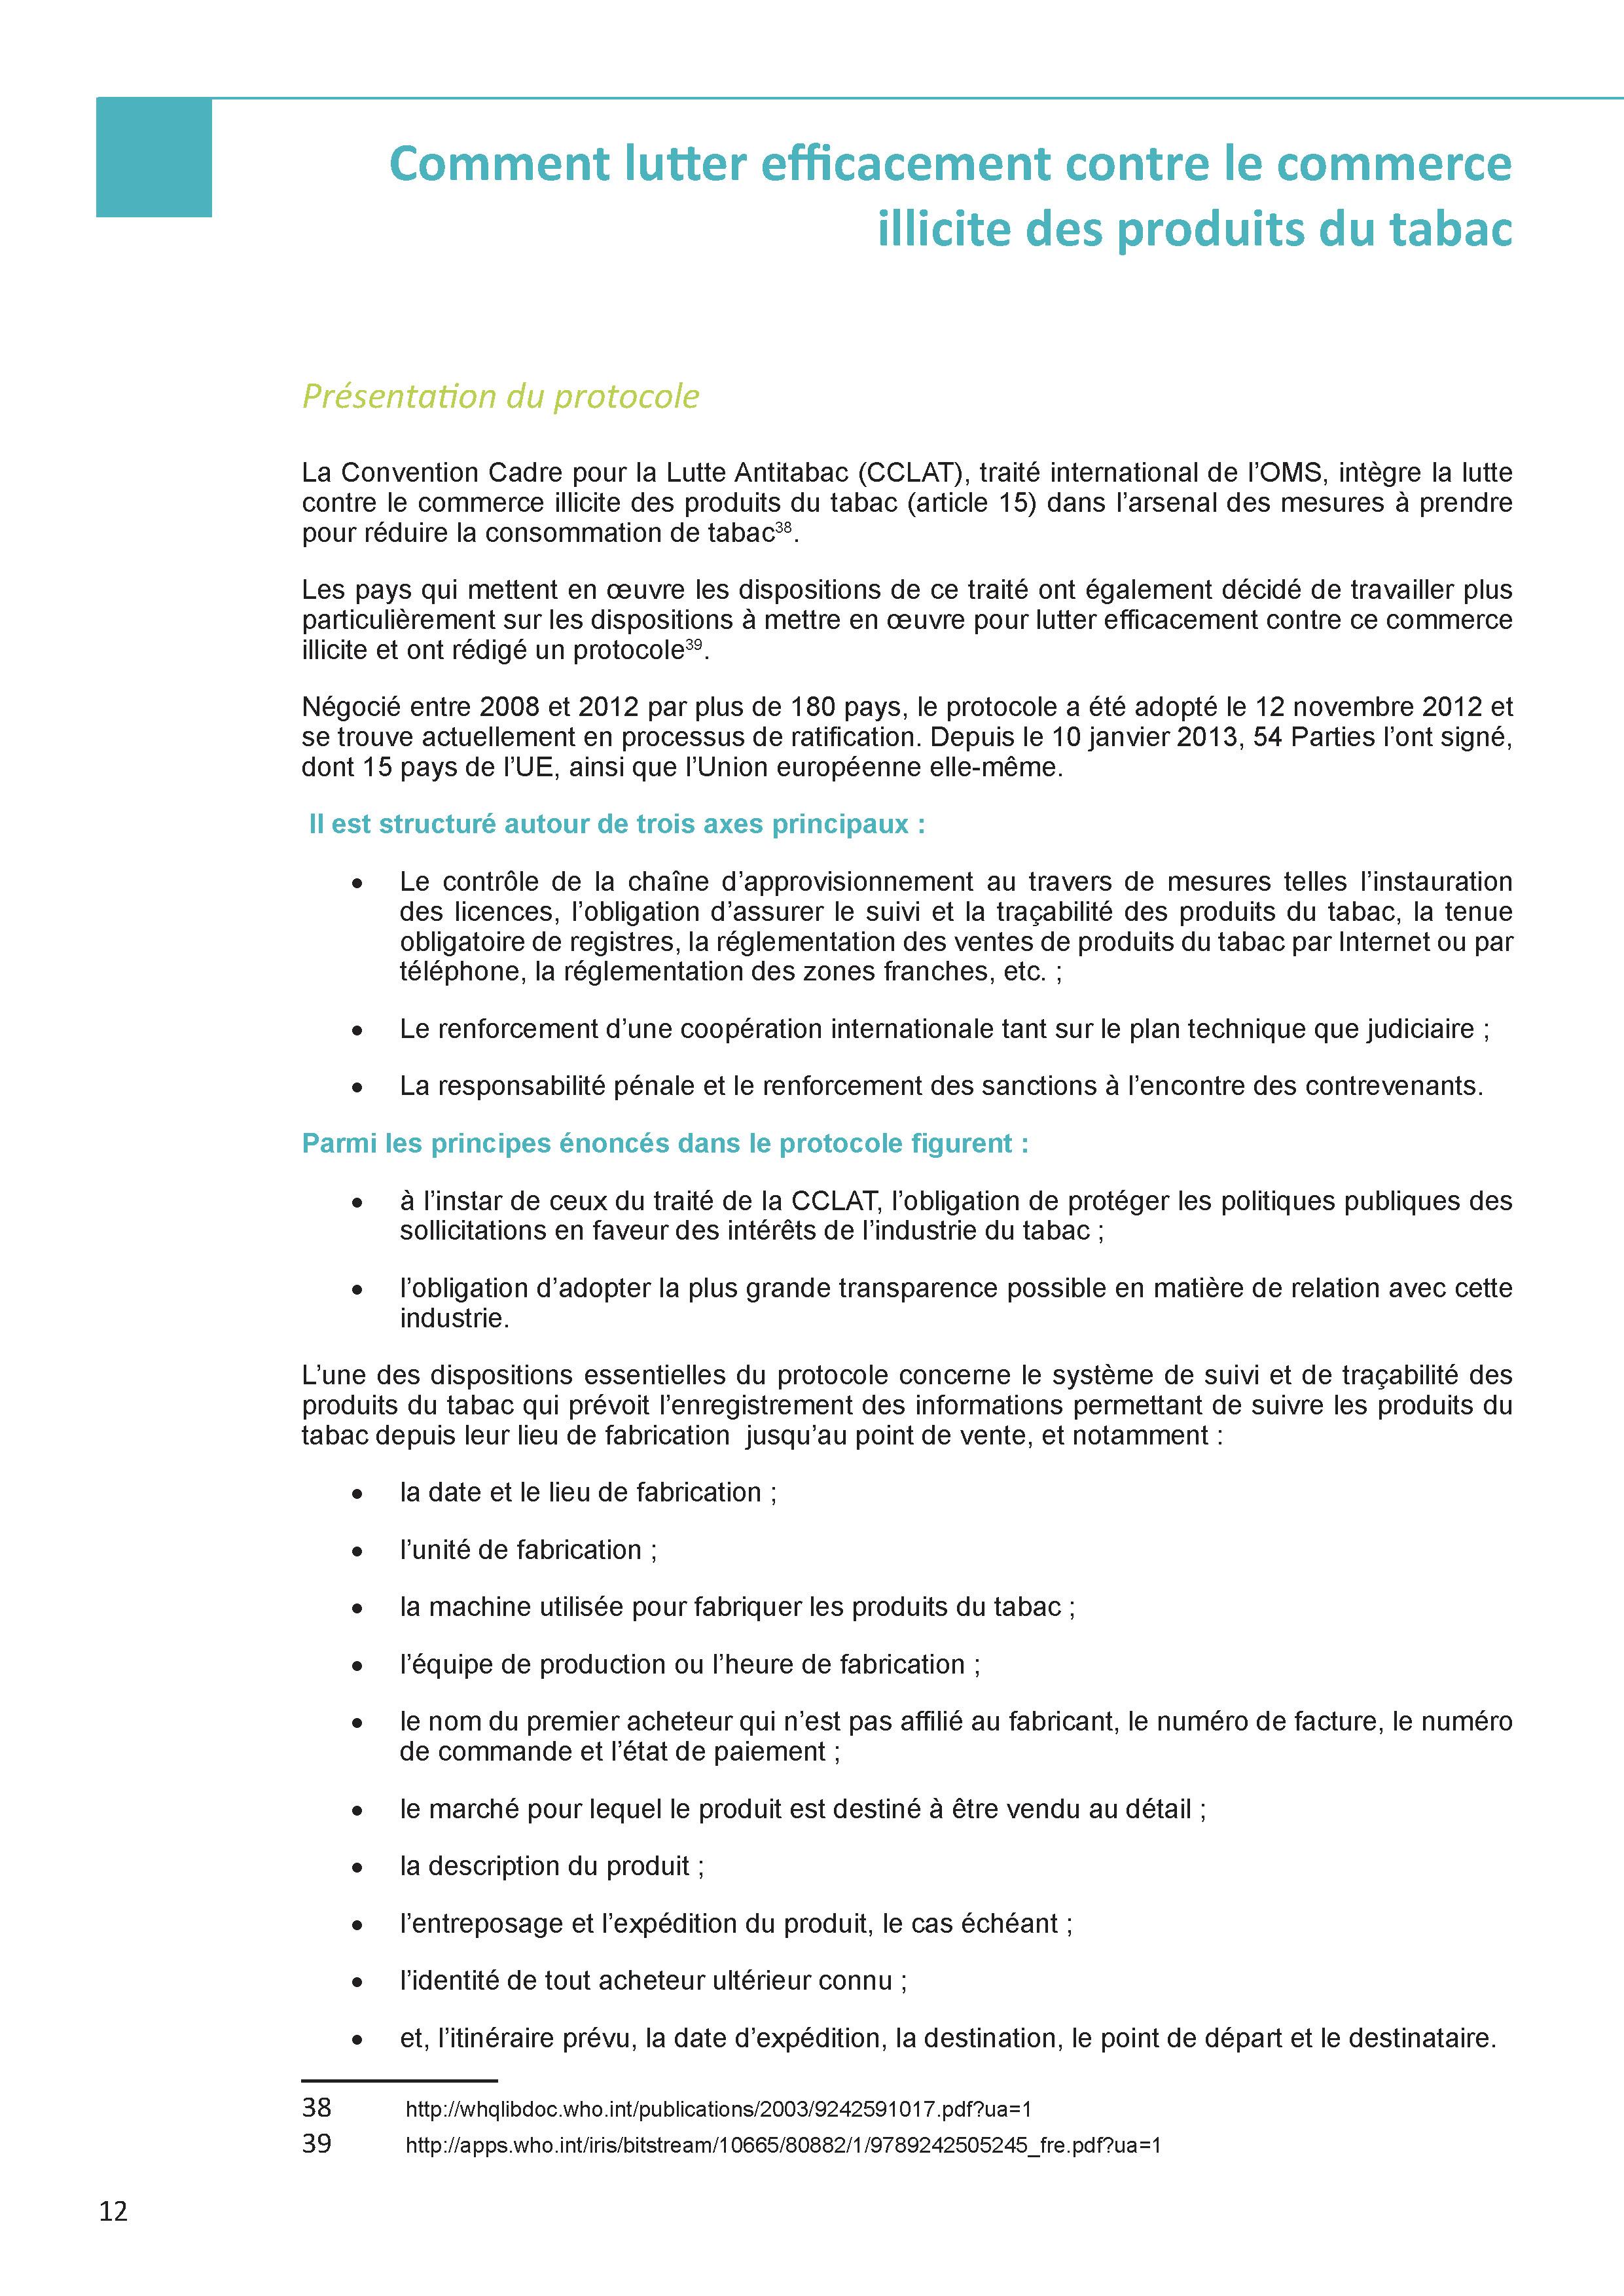 Alliance-DP_commerce-illicite-26mai2015_Page_12.jpg